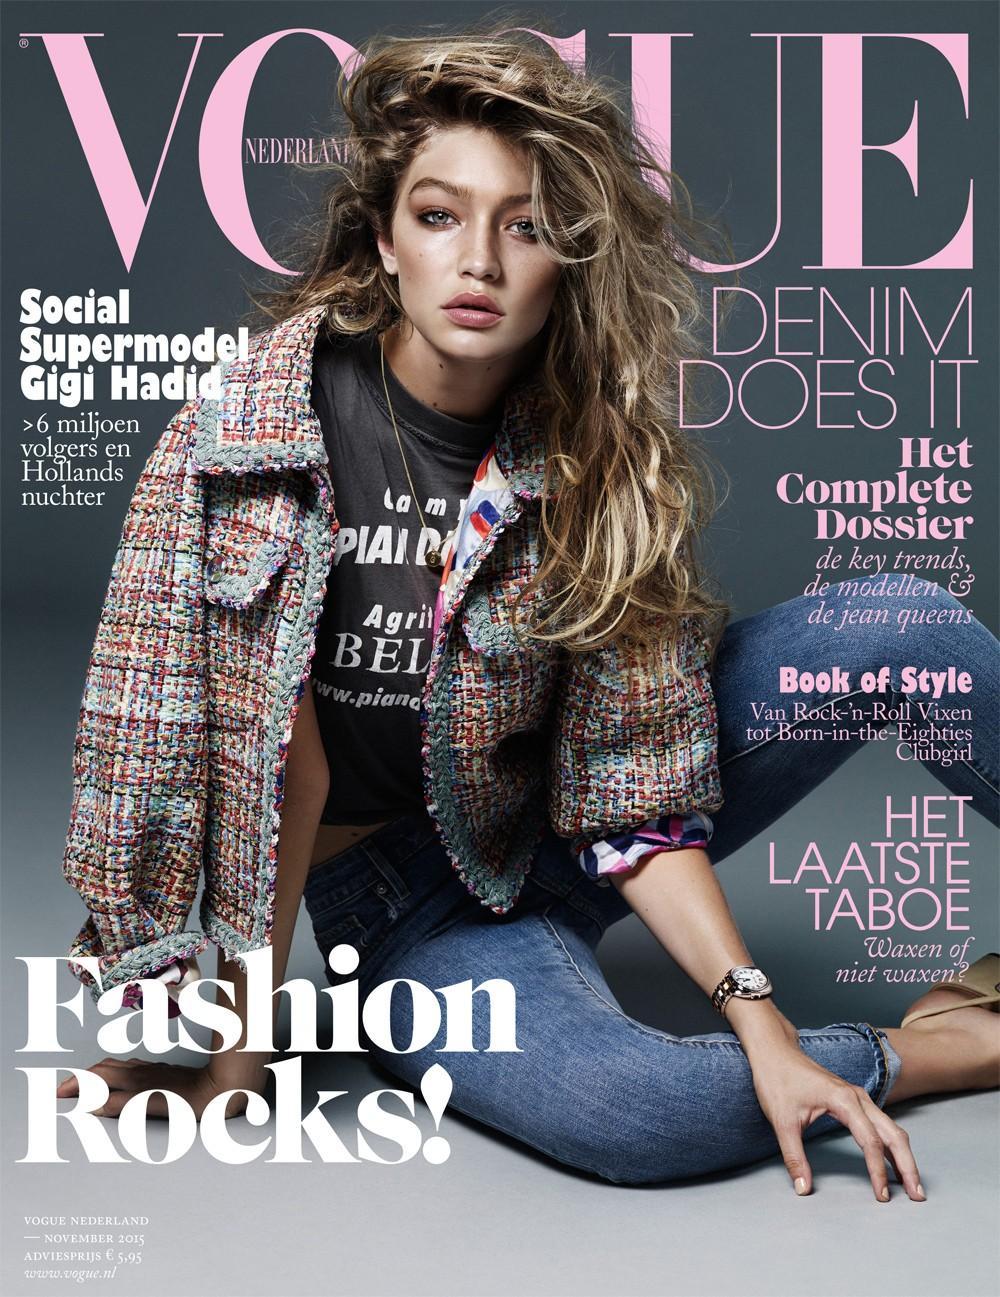 Vogue Magazine: Vogue's Covers: Gigi Hadid